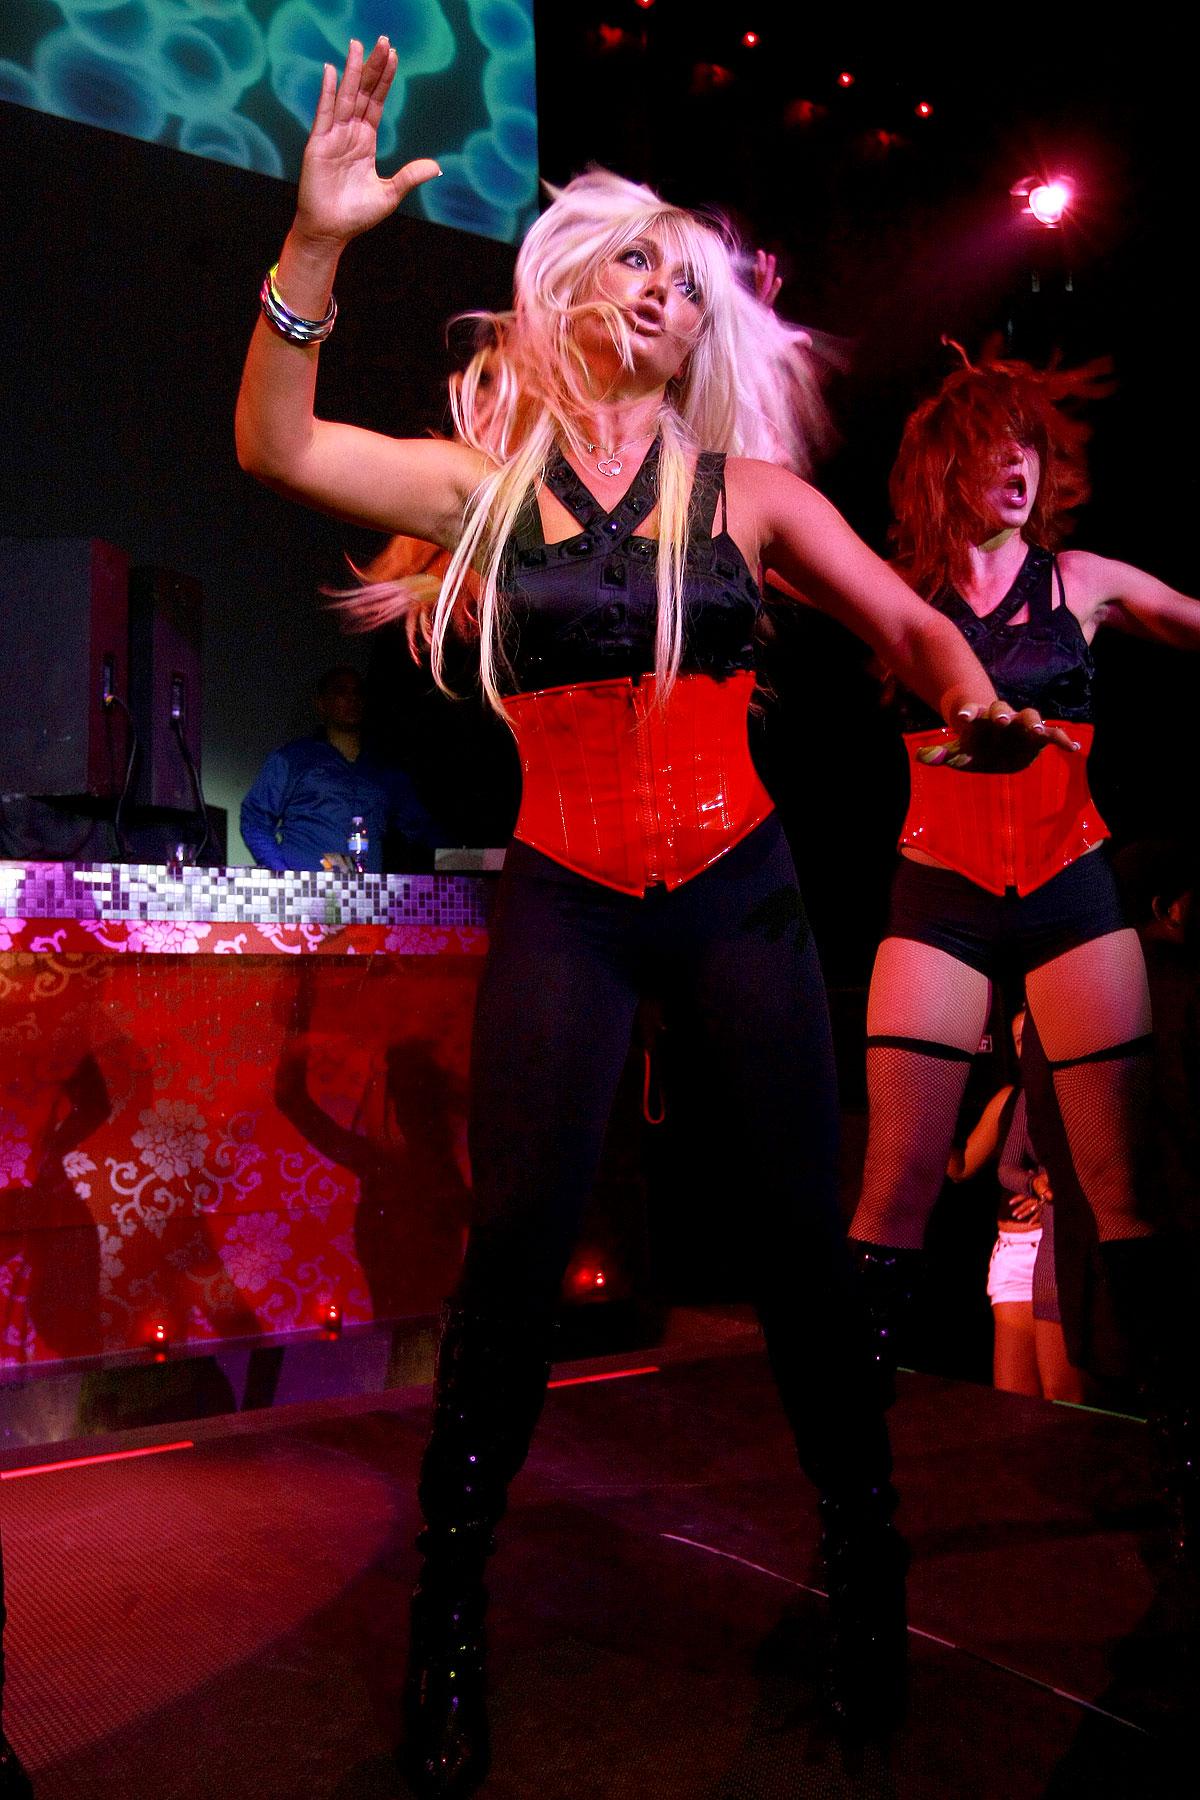 PHOTO GALLERY: Brooke Hogan On Stage